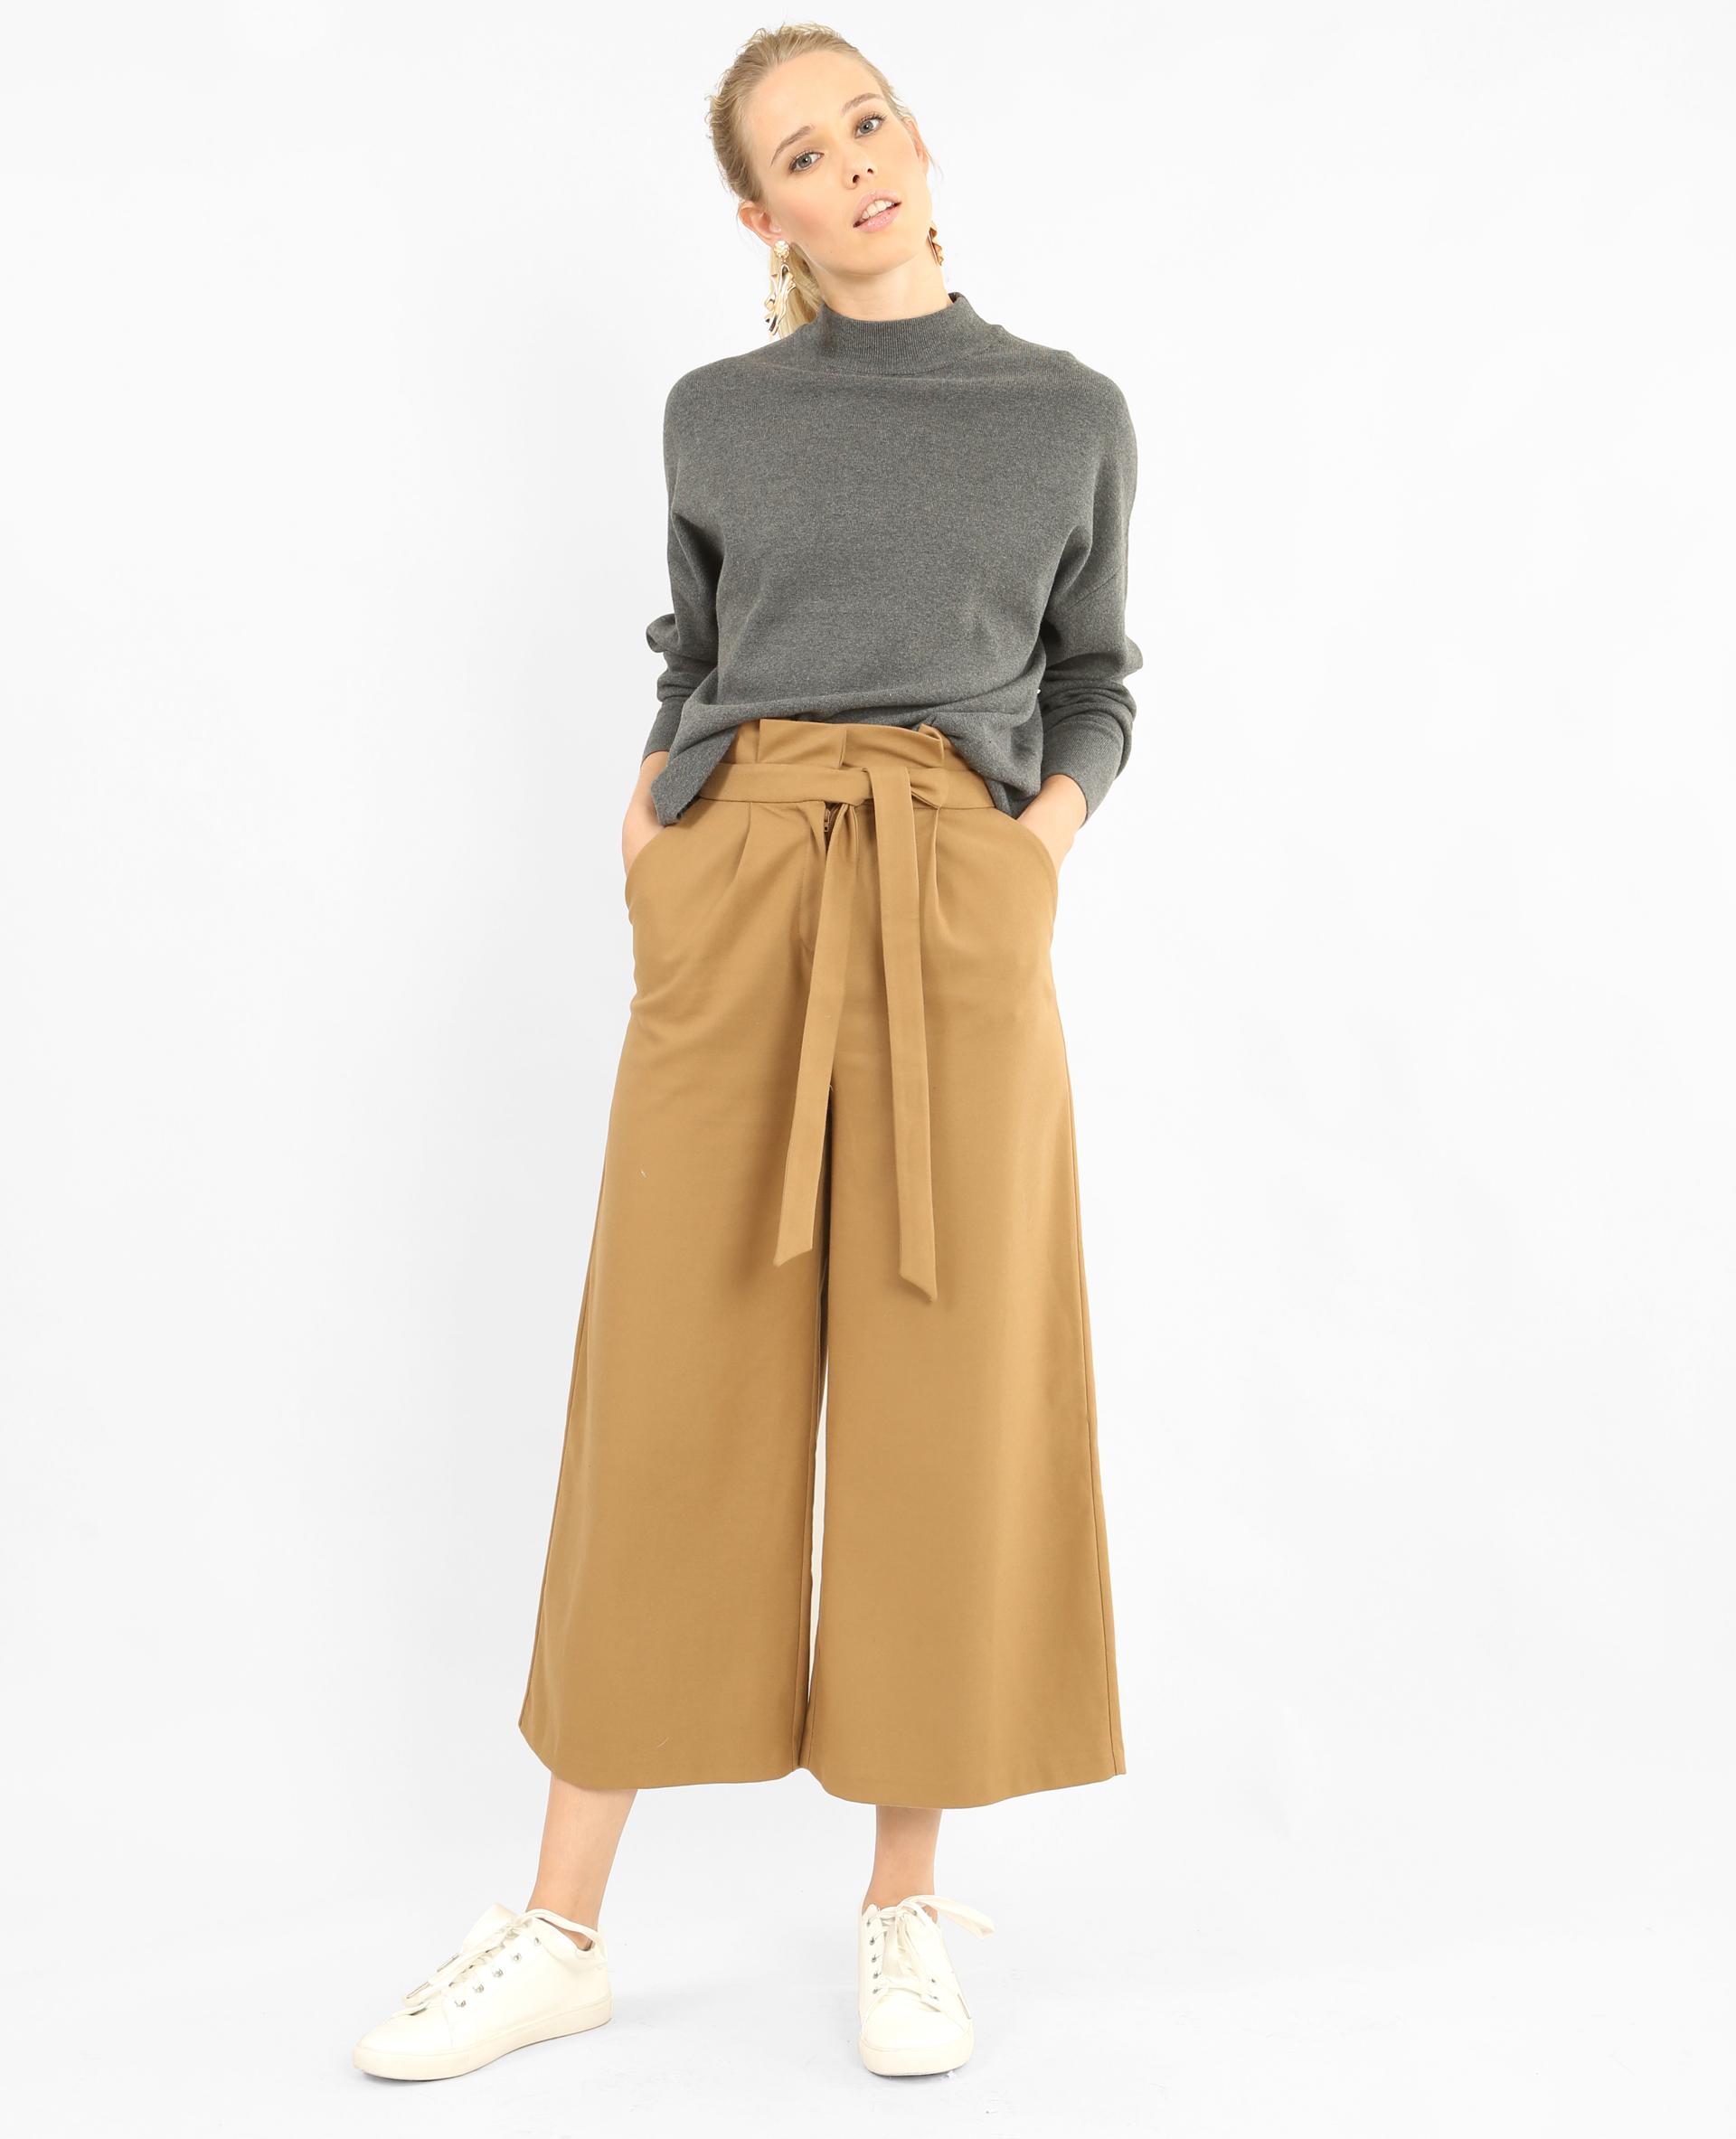 jupe culotte taille haute caramel 140483721a07 pimkie. Black Bedroom Furniture Sets. Home Design Ideas